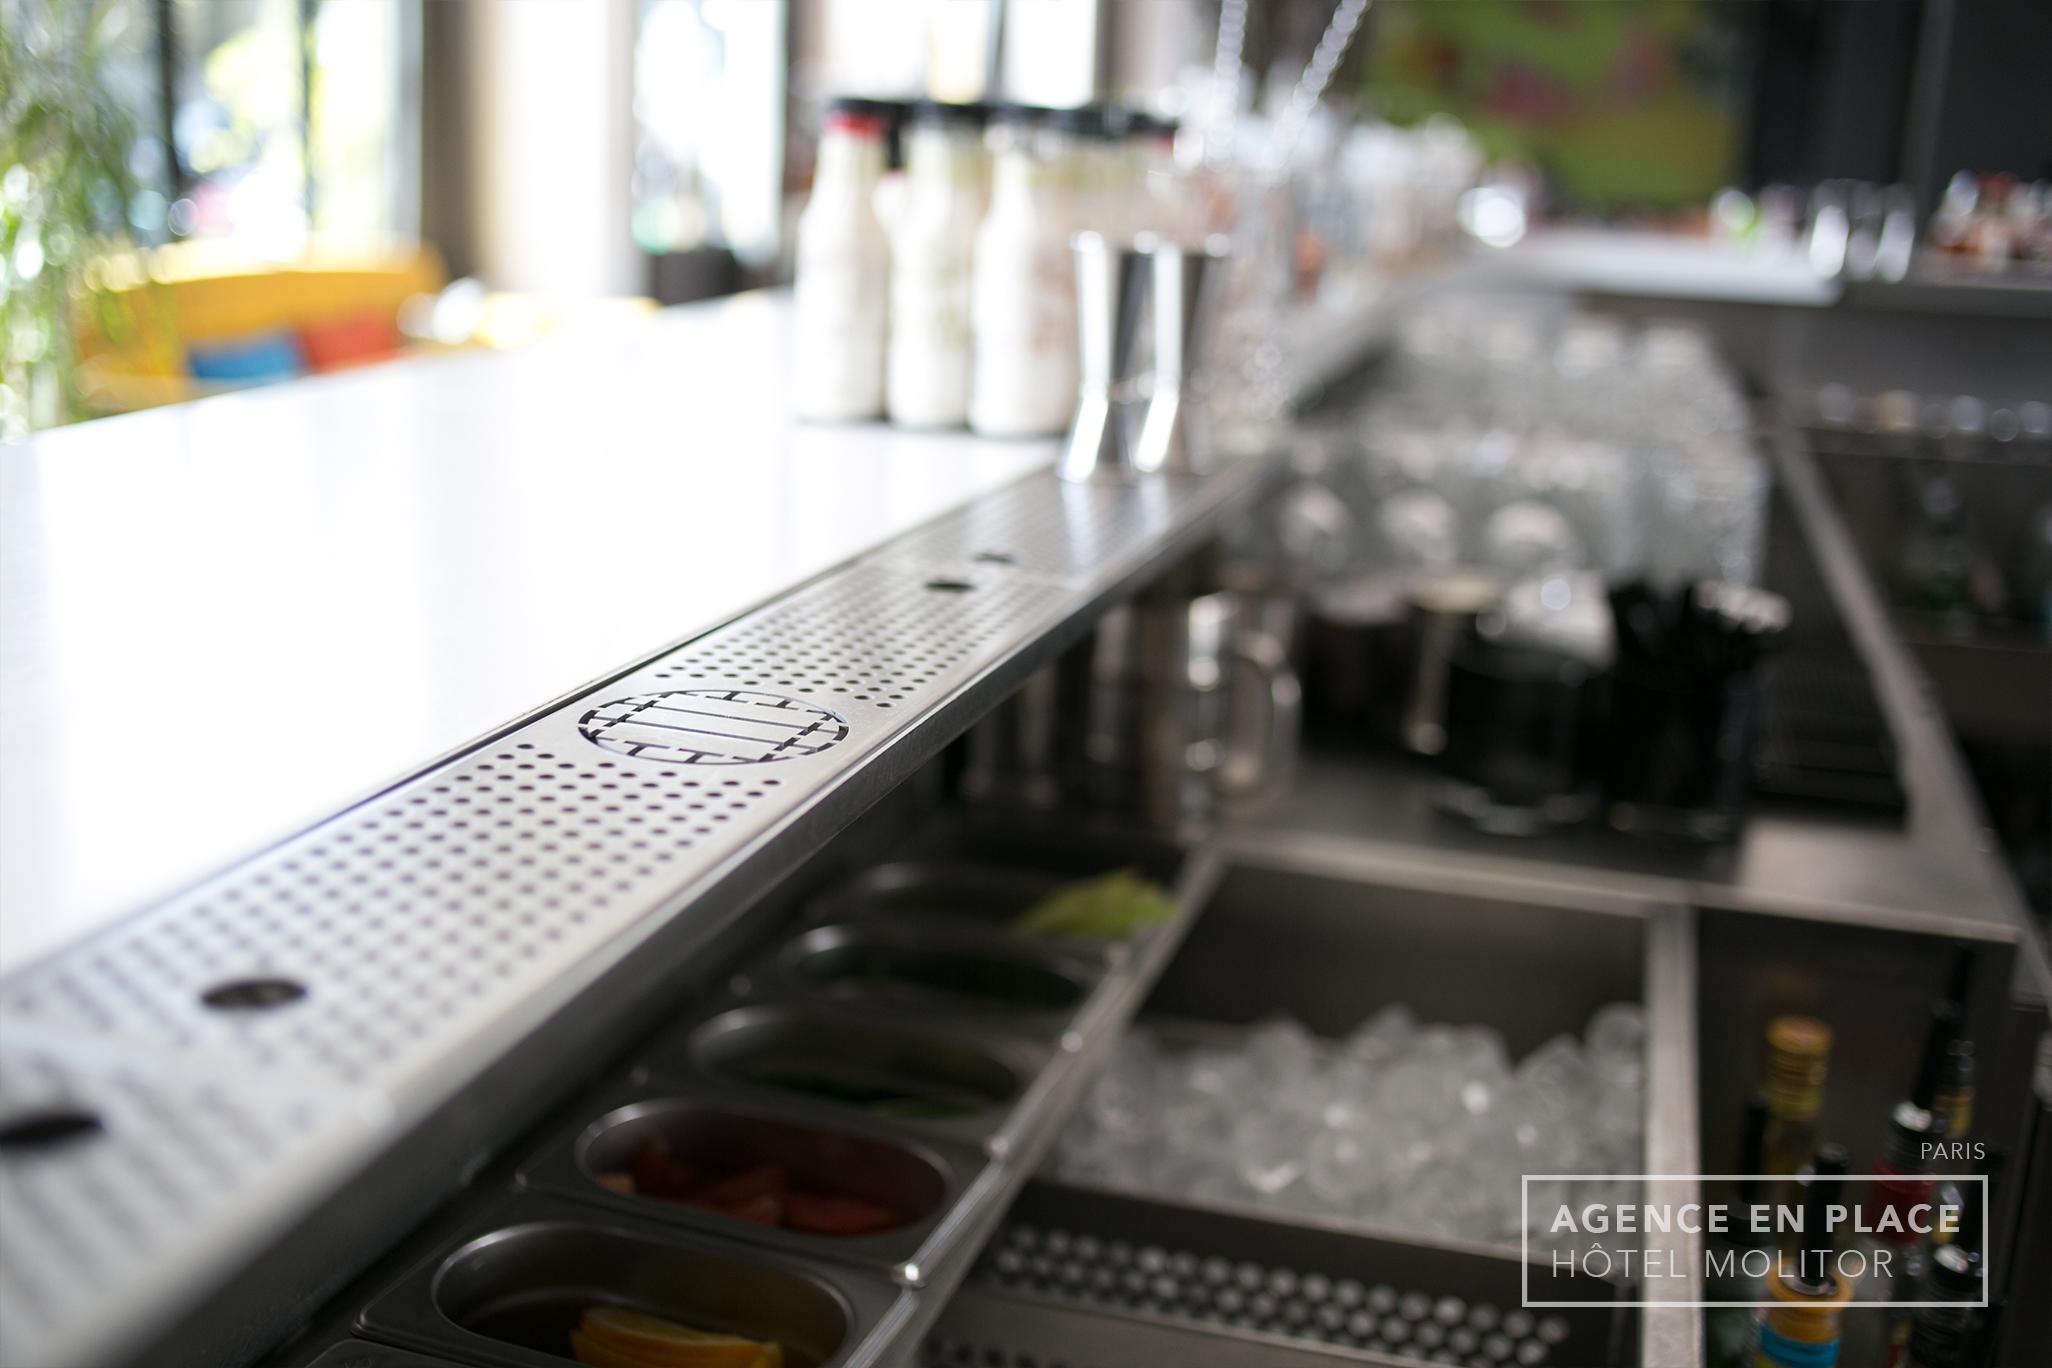 hotelmolitor-agenceenplace-cocktailsbar002